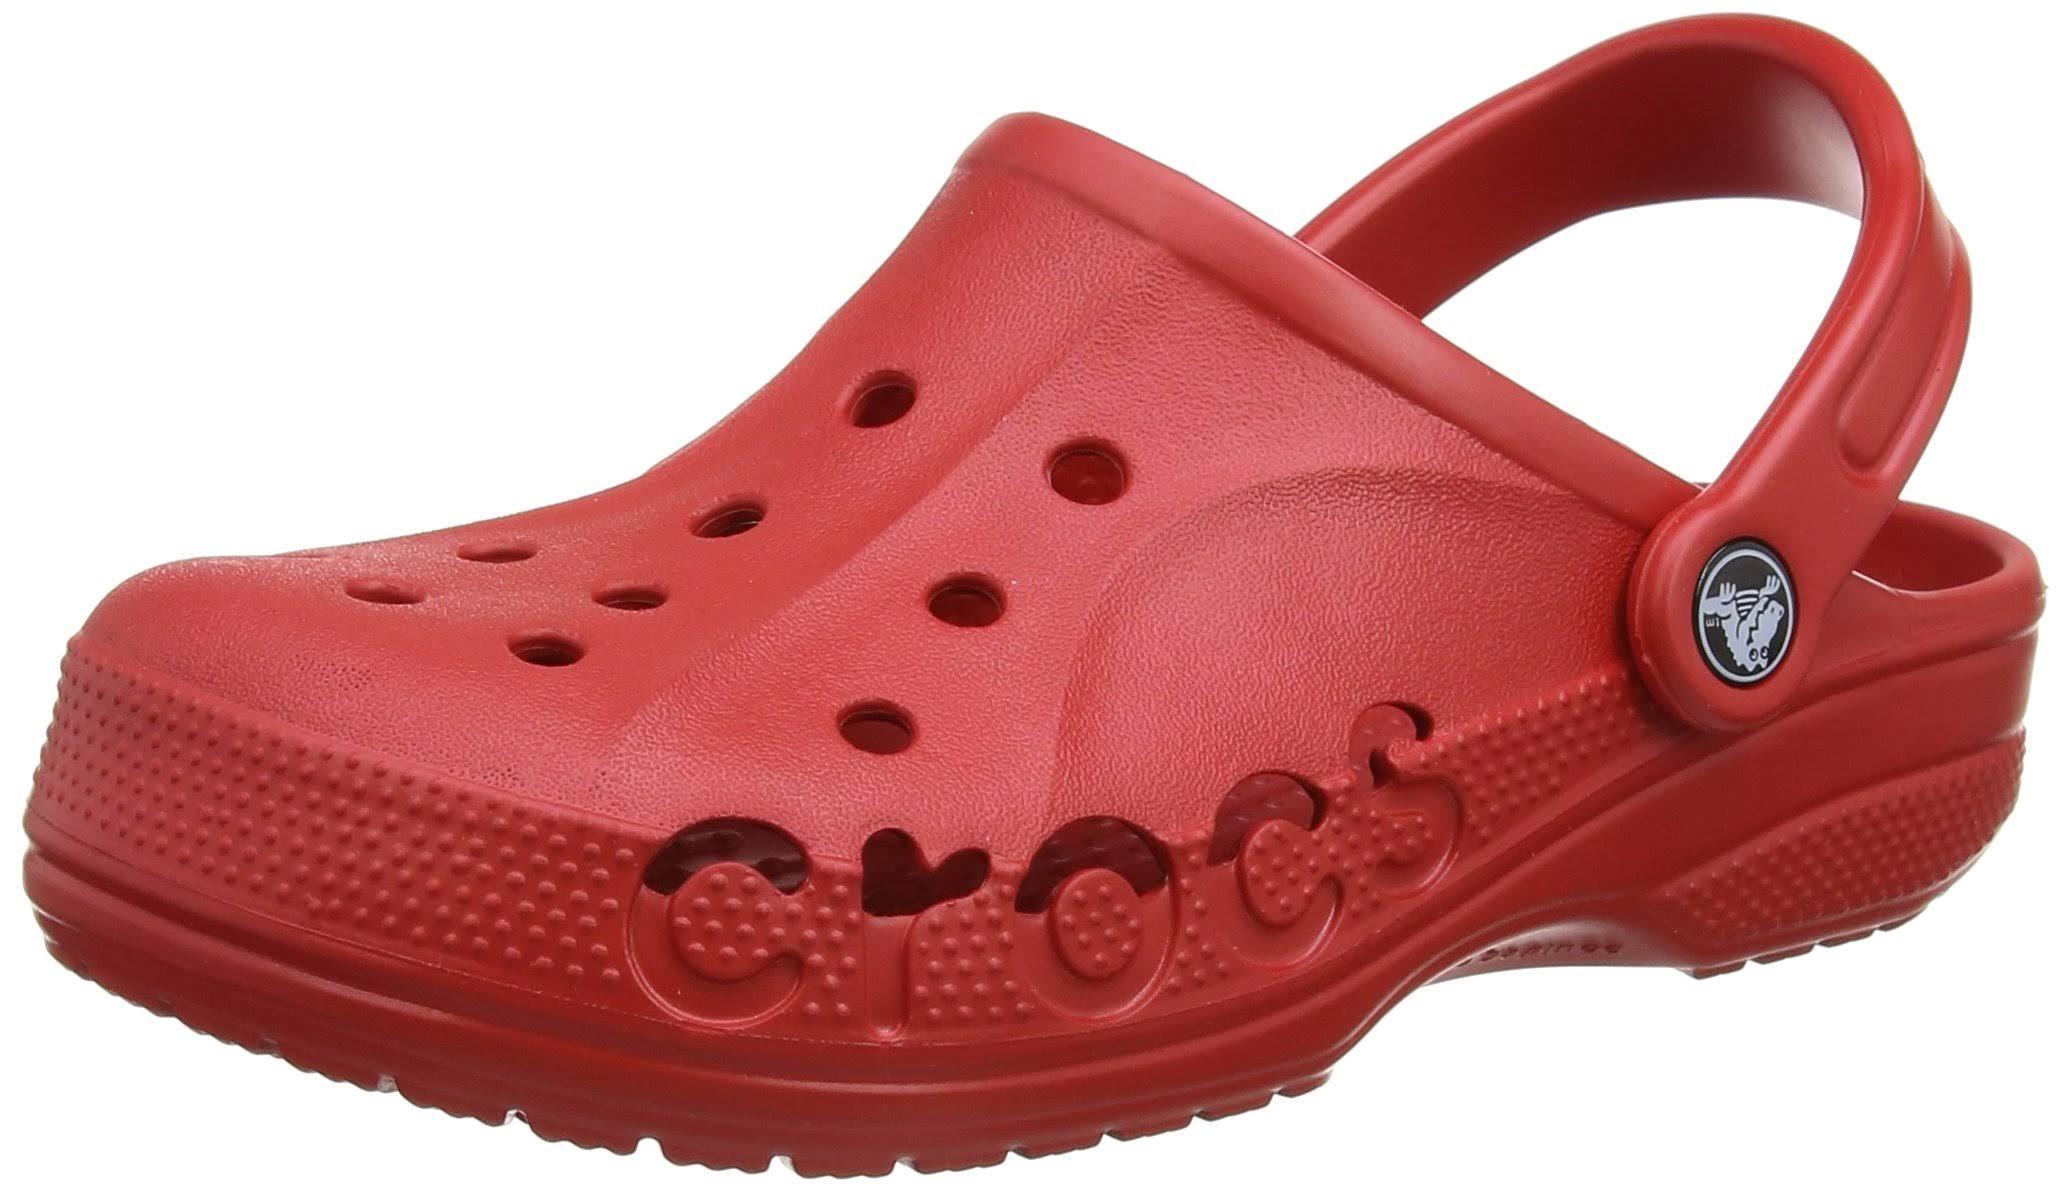 Baya Baya Red Red Crocs W9m7 Clogdimensioni Crocs F3K1c5ulJT